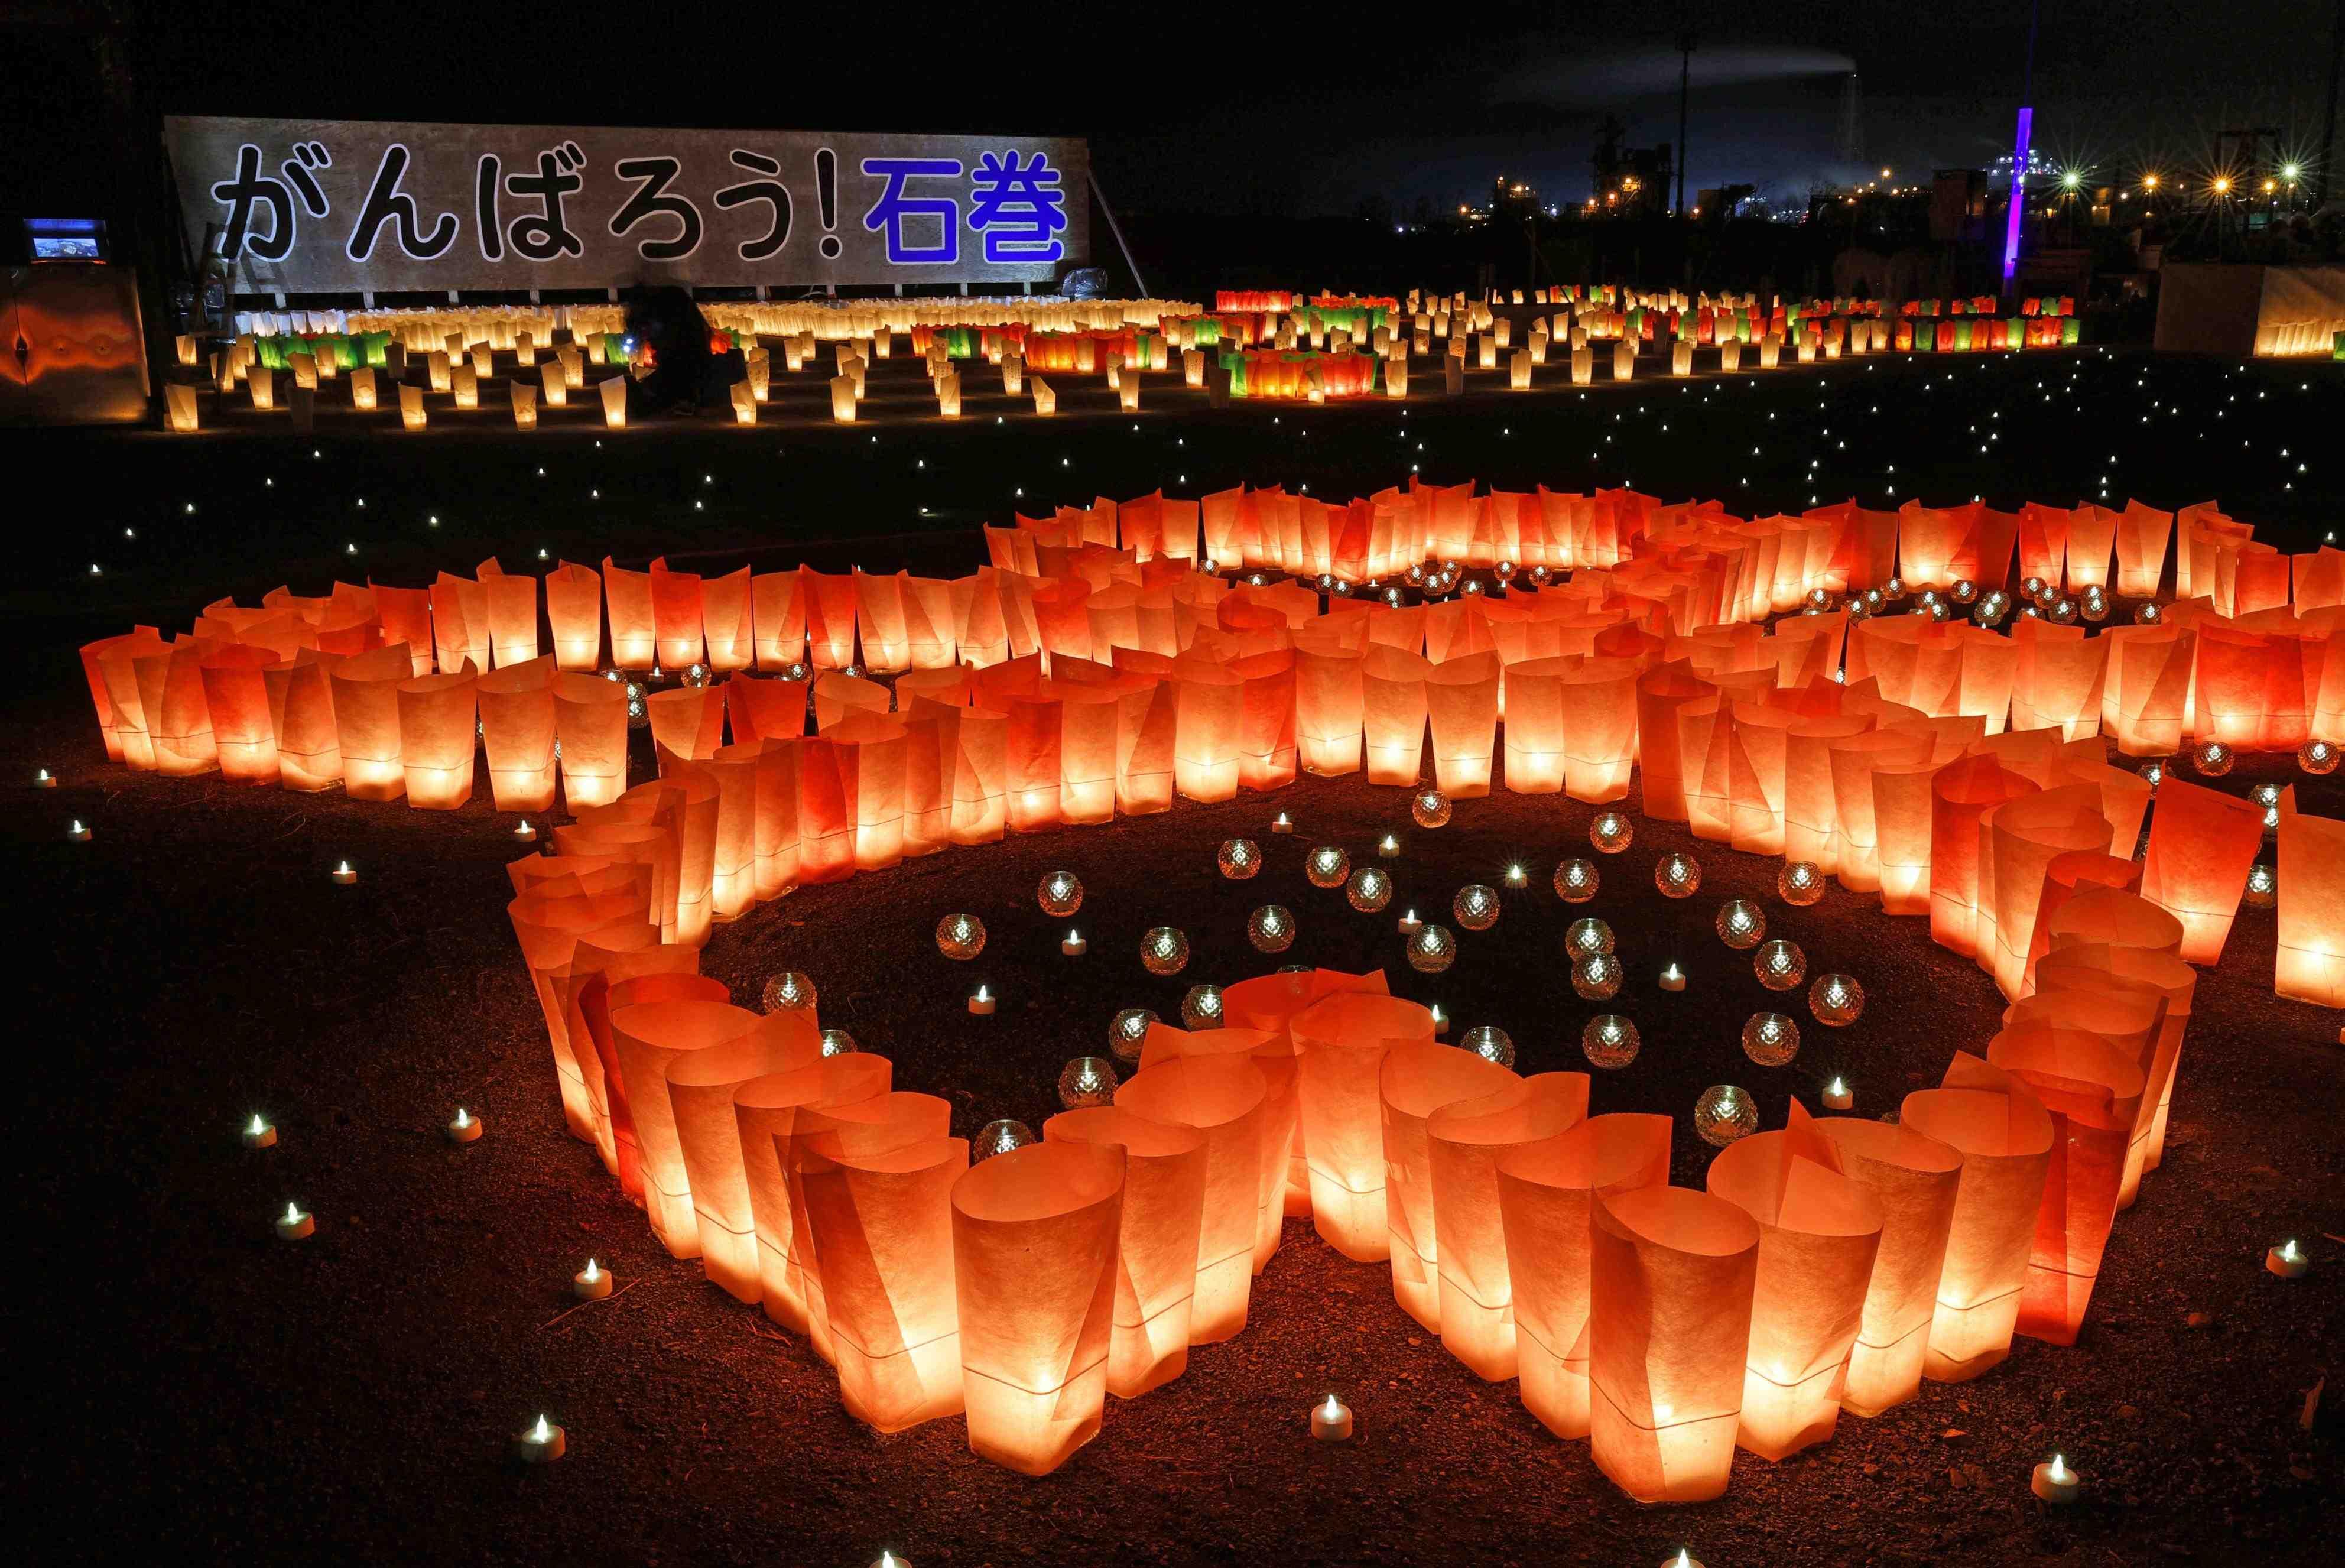 Japan 3.11 Anniversary The Great Tohoku Earthquake 018